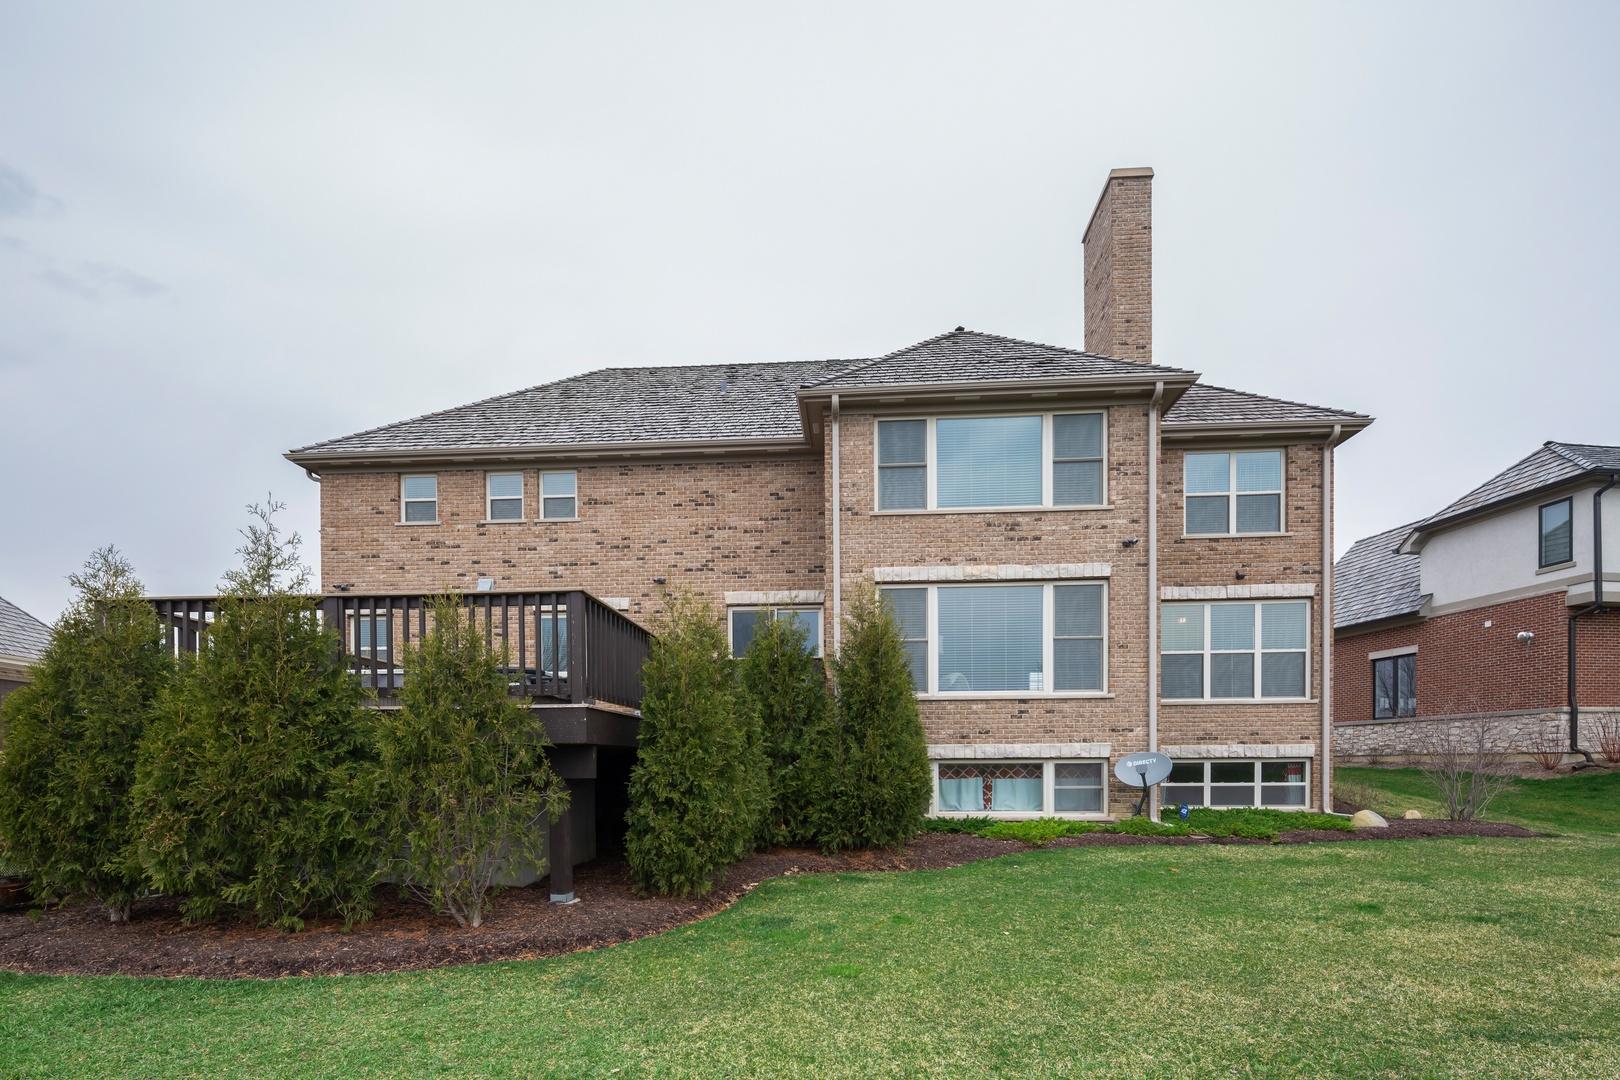 1622 Lake Charles, VERNON HILLS, Illinois, 60061